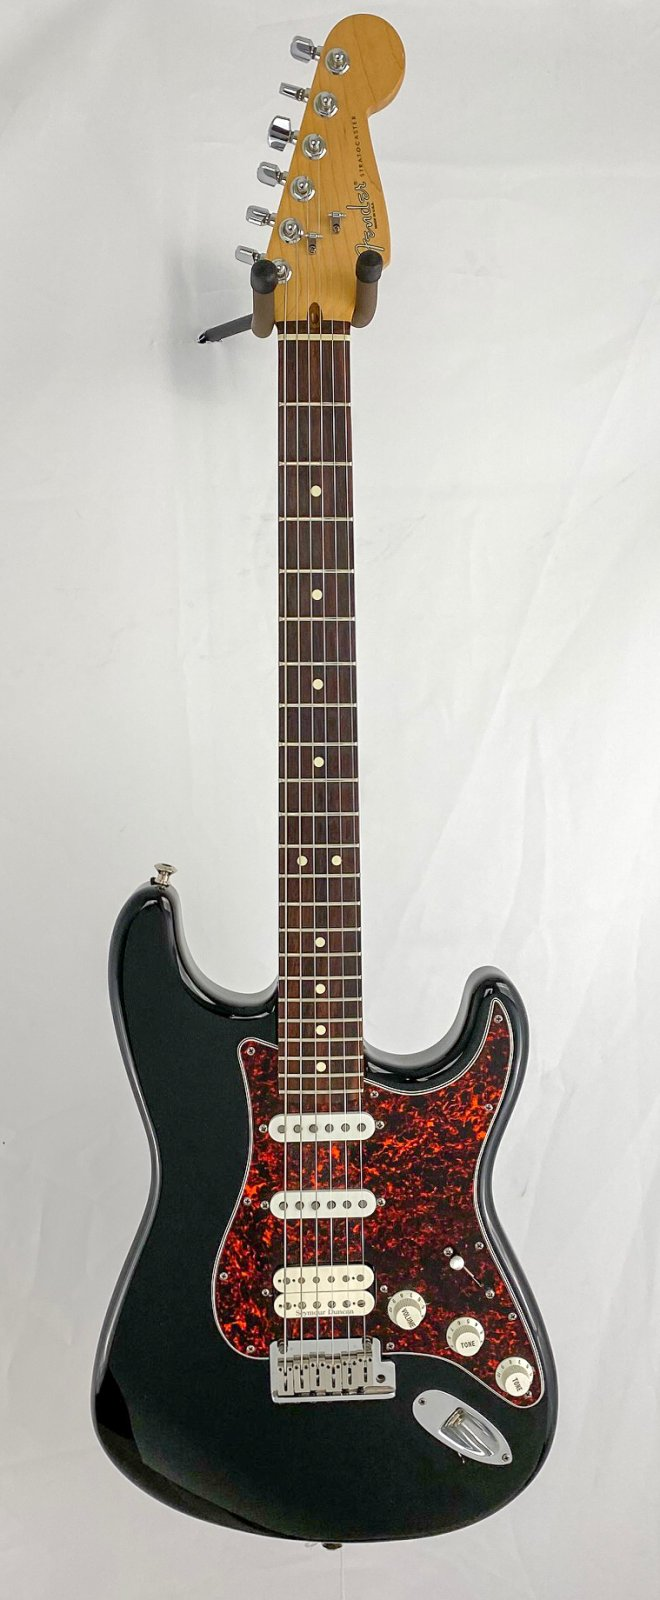 1997 Fender American Lonestar Strat w/case